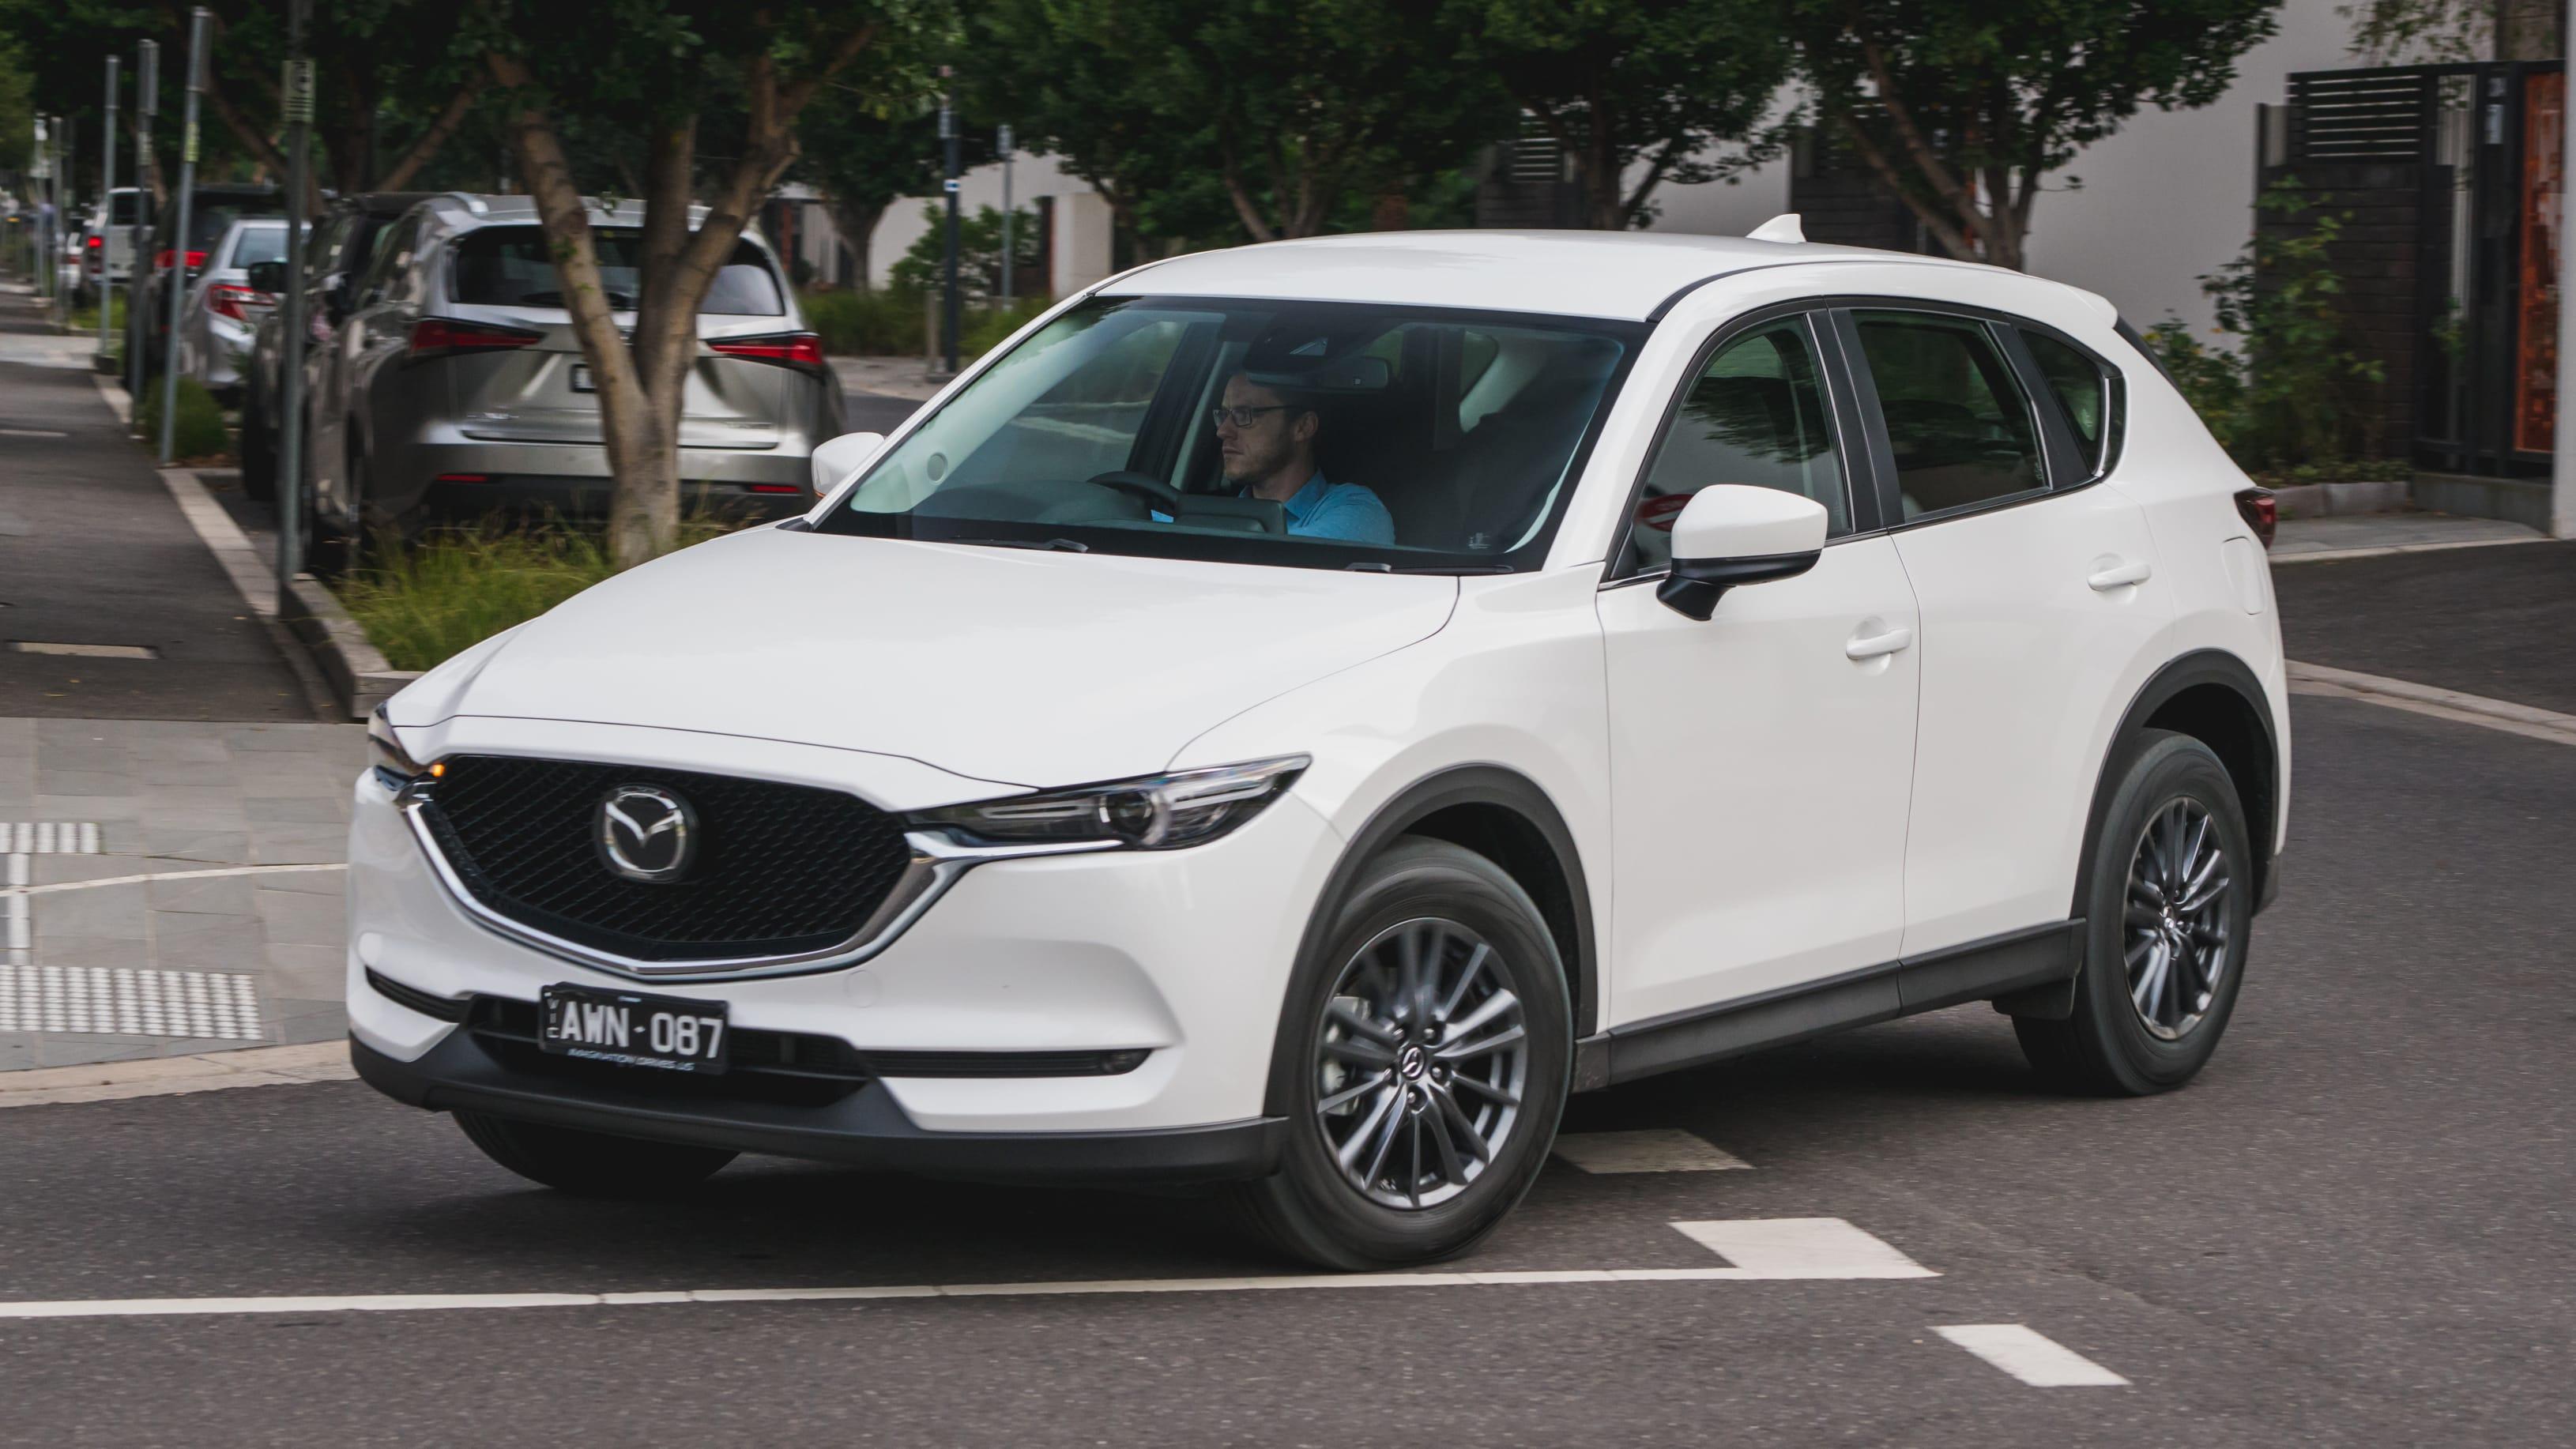 2019 Mazda CX-5 Maxx Sport AWD review | CarAdvice